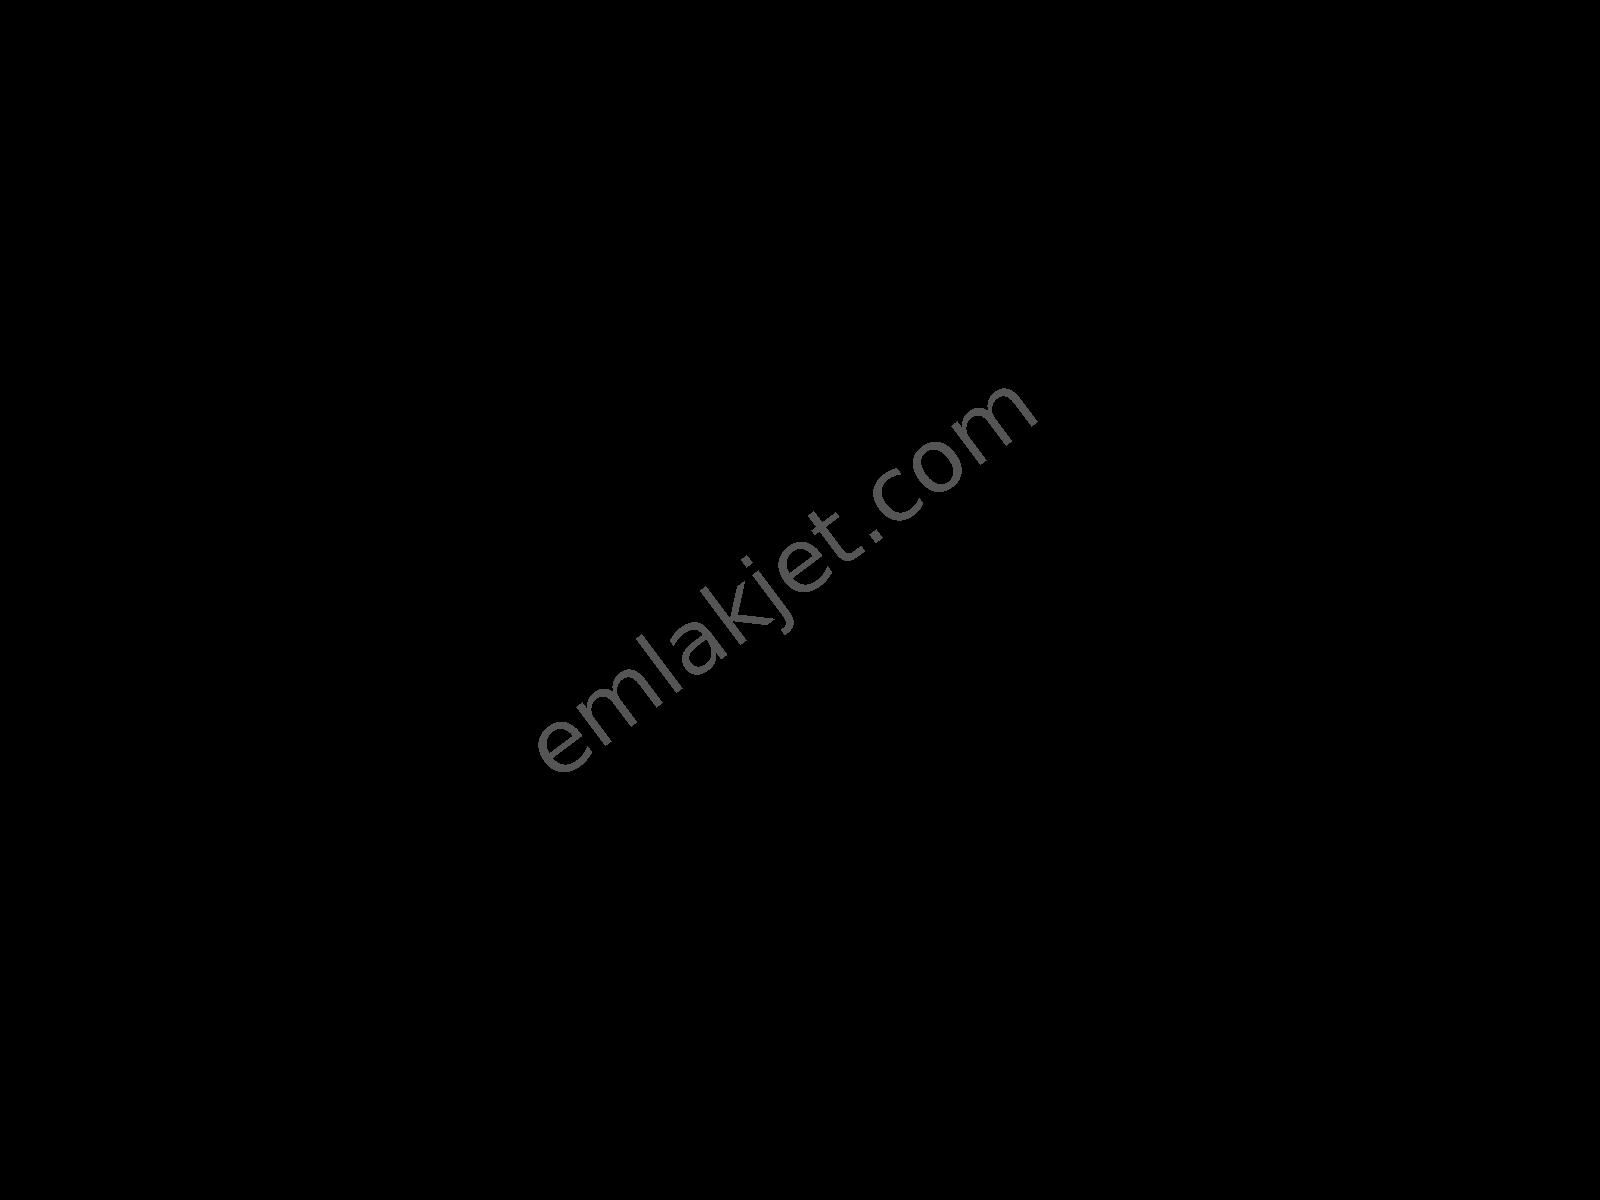 https://imaj.emlakjet.com/listing/9314430/F354B3C8C67FF66A1DB3E5A55D68550A9314430.jpg